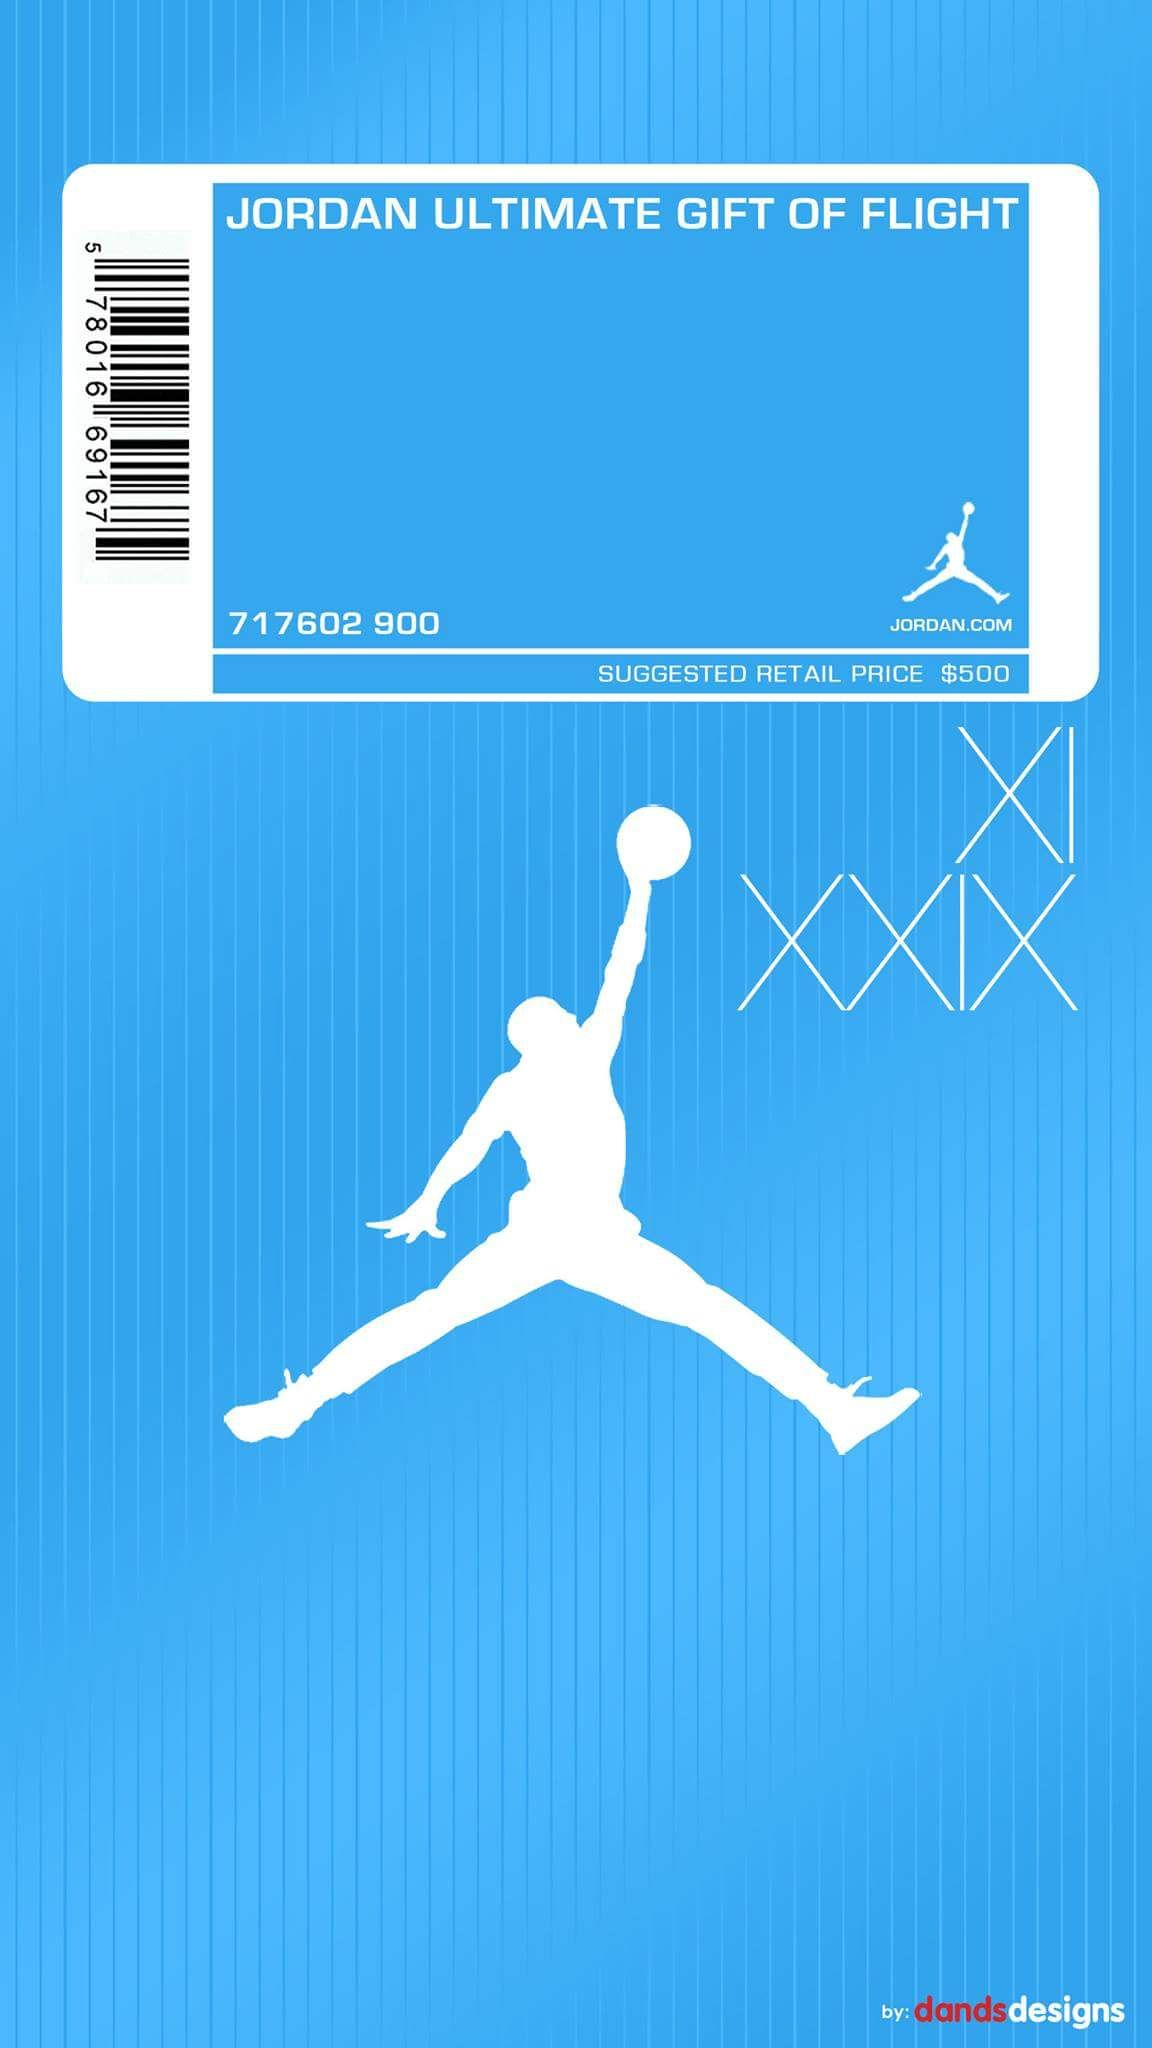 10903845 825611997475541 5100280630180573403 O 1152x2048 Pixels Jordan 11Michael JordanJordan ShoesCurry WallpaperIphone WallpapersAir JordansNike